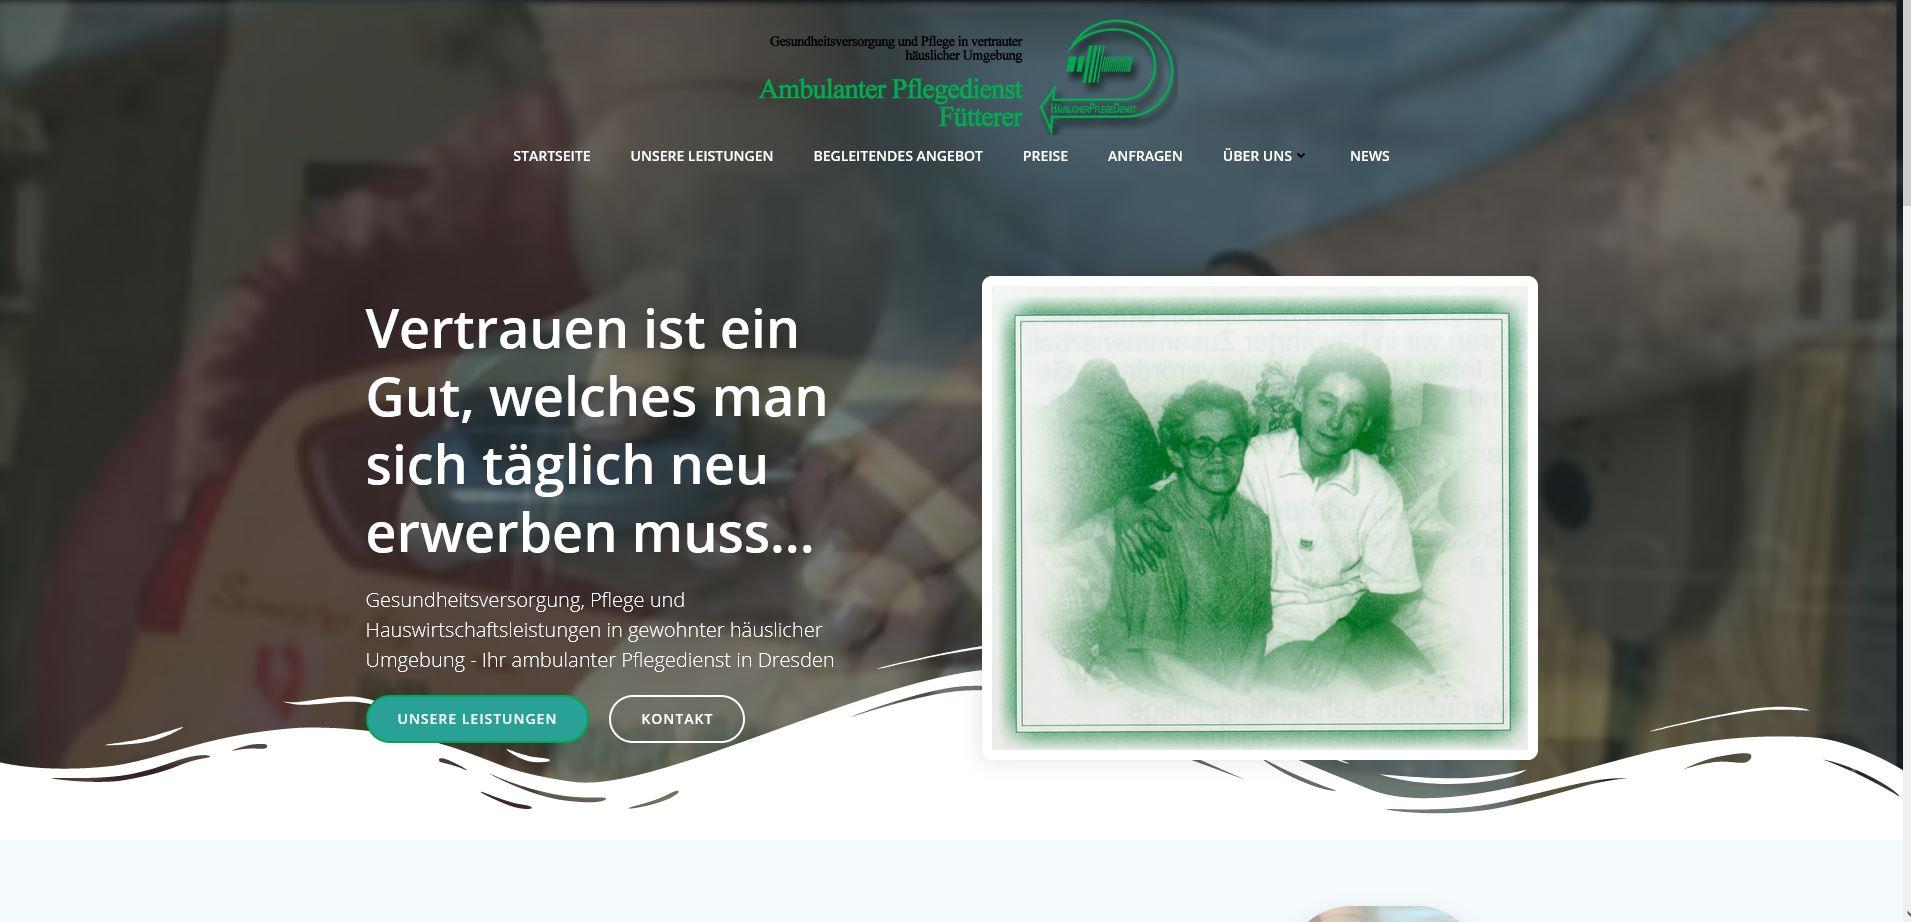 Internetprojekt – Pflegedienst Fütterer aus Dresden – ist nun auch abgeschlossen